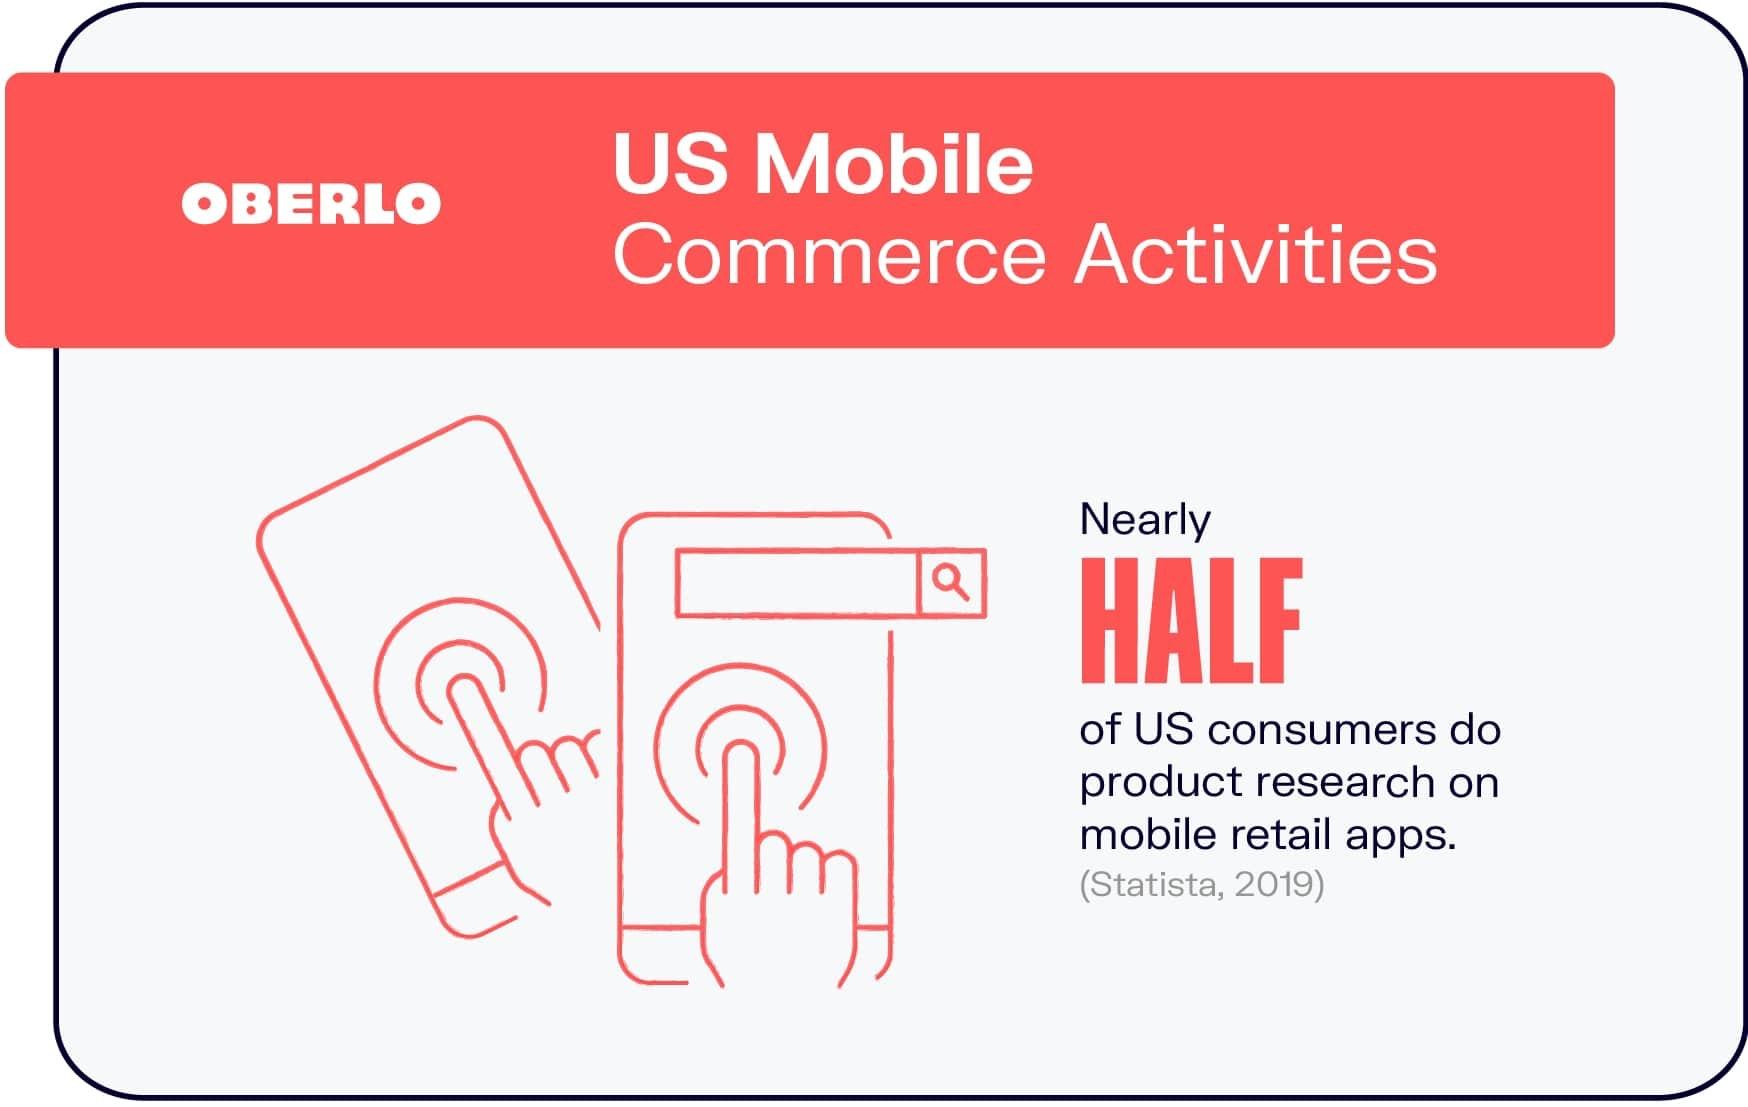 US Mobile Commerce Activities